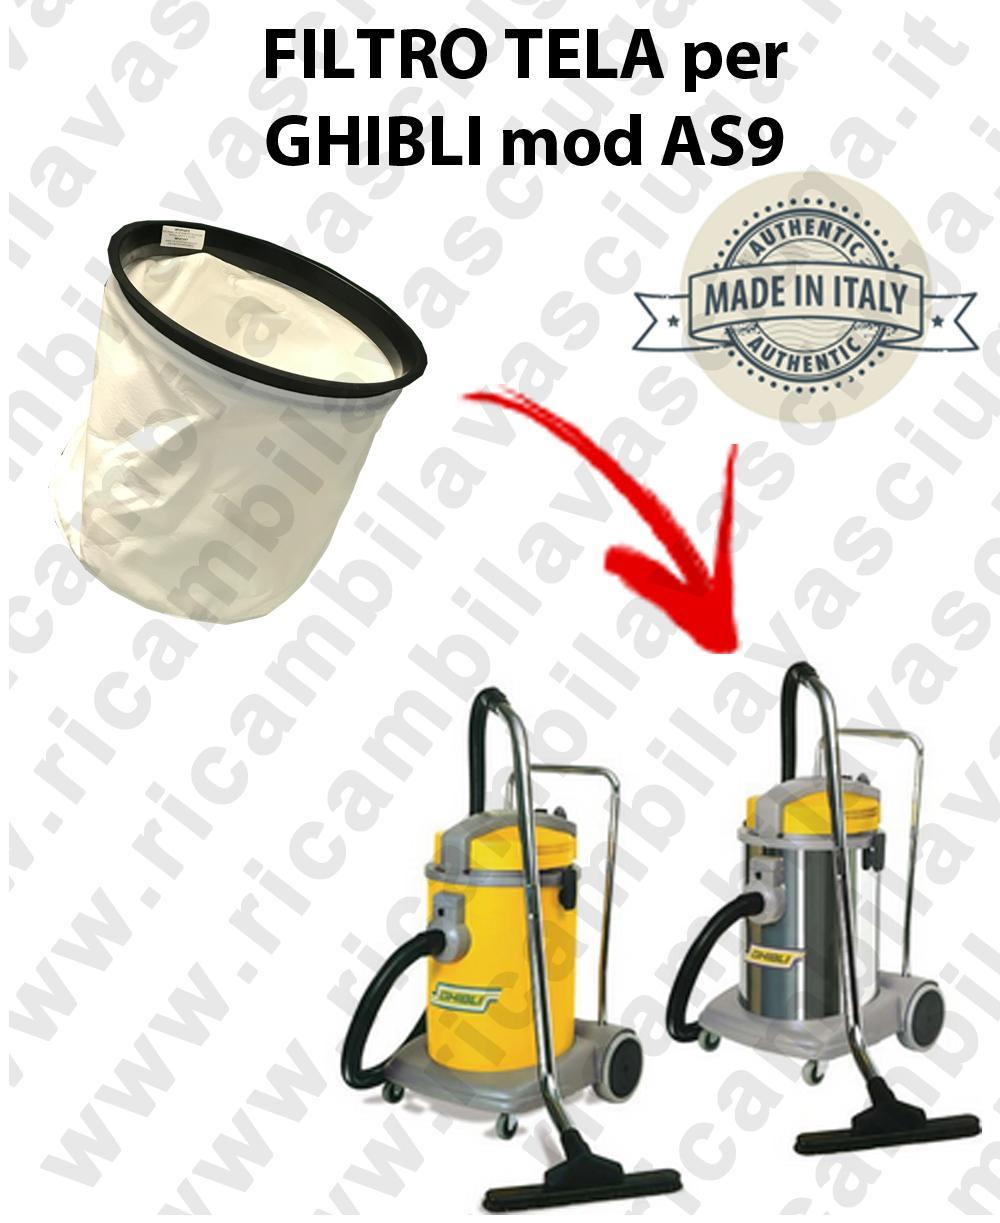 Filtro de tela para aspiradora GHIBLI Model AS9